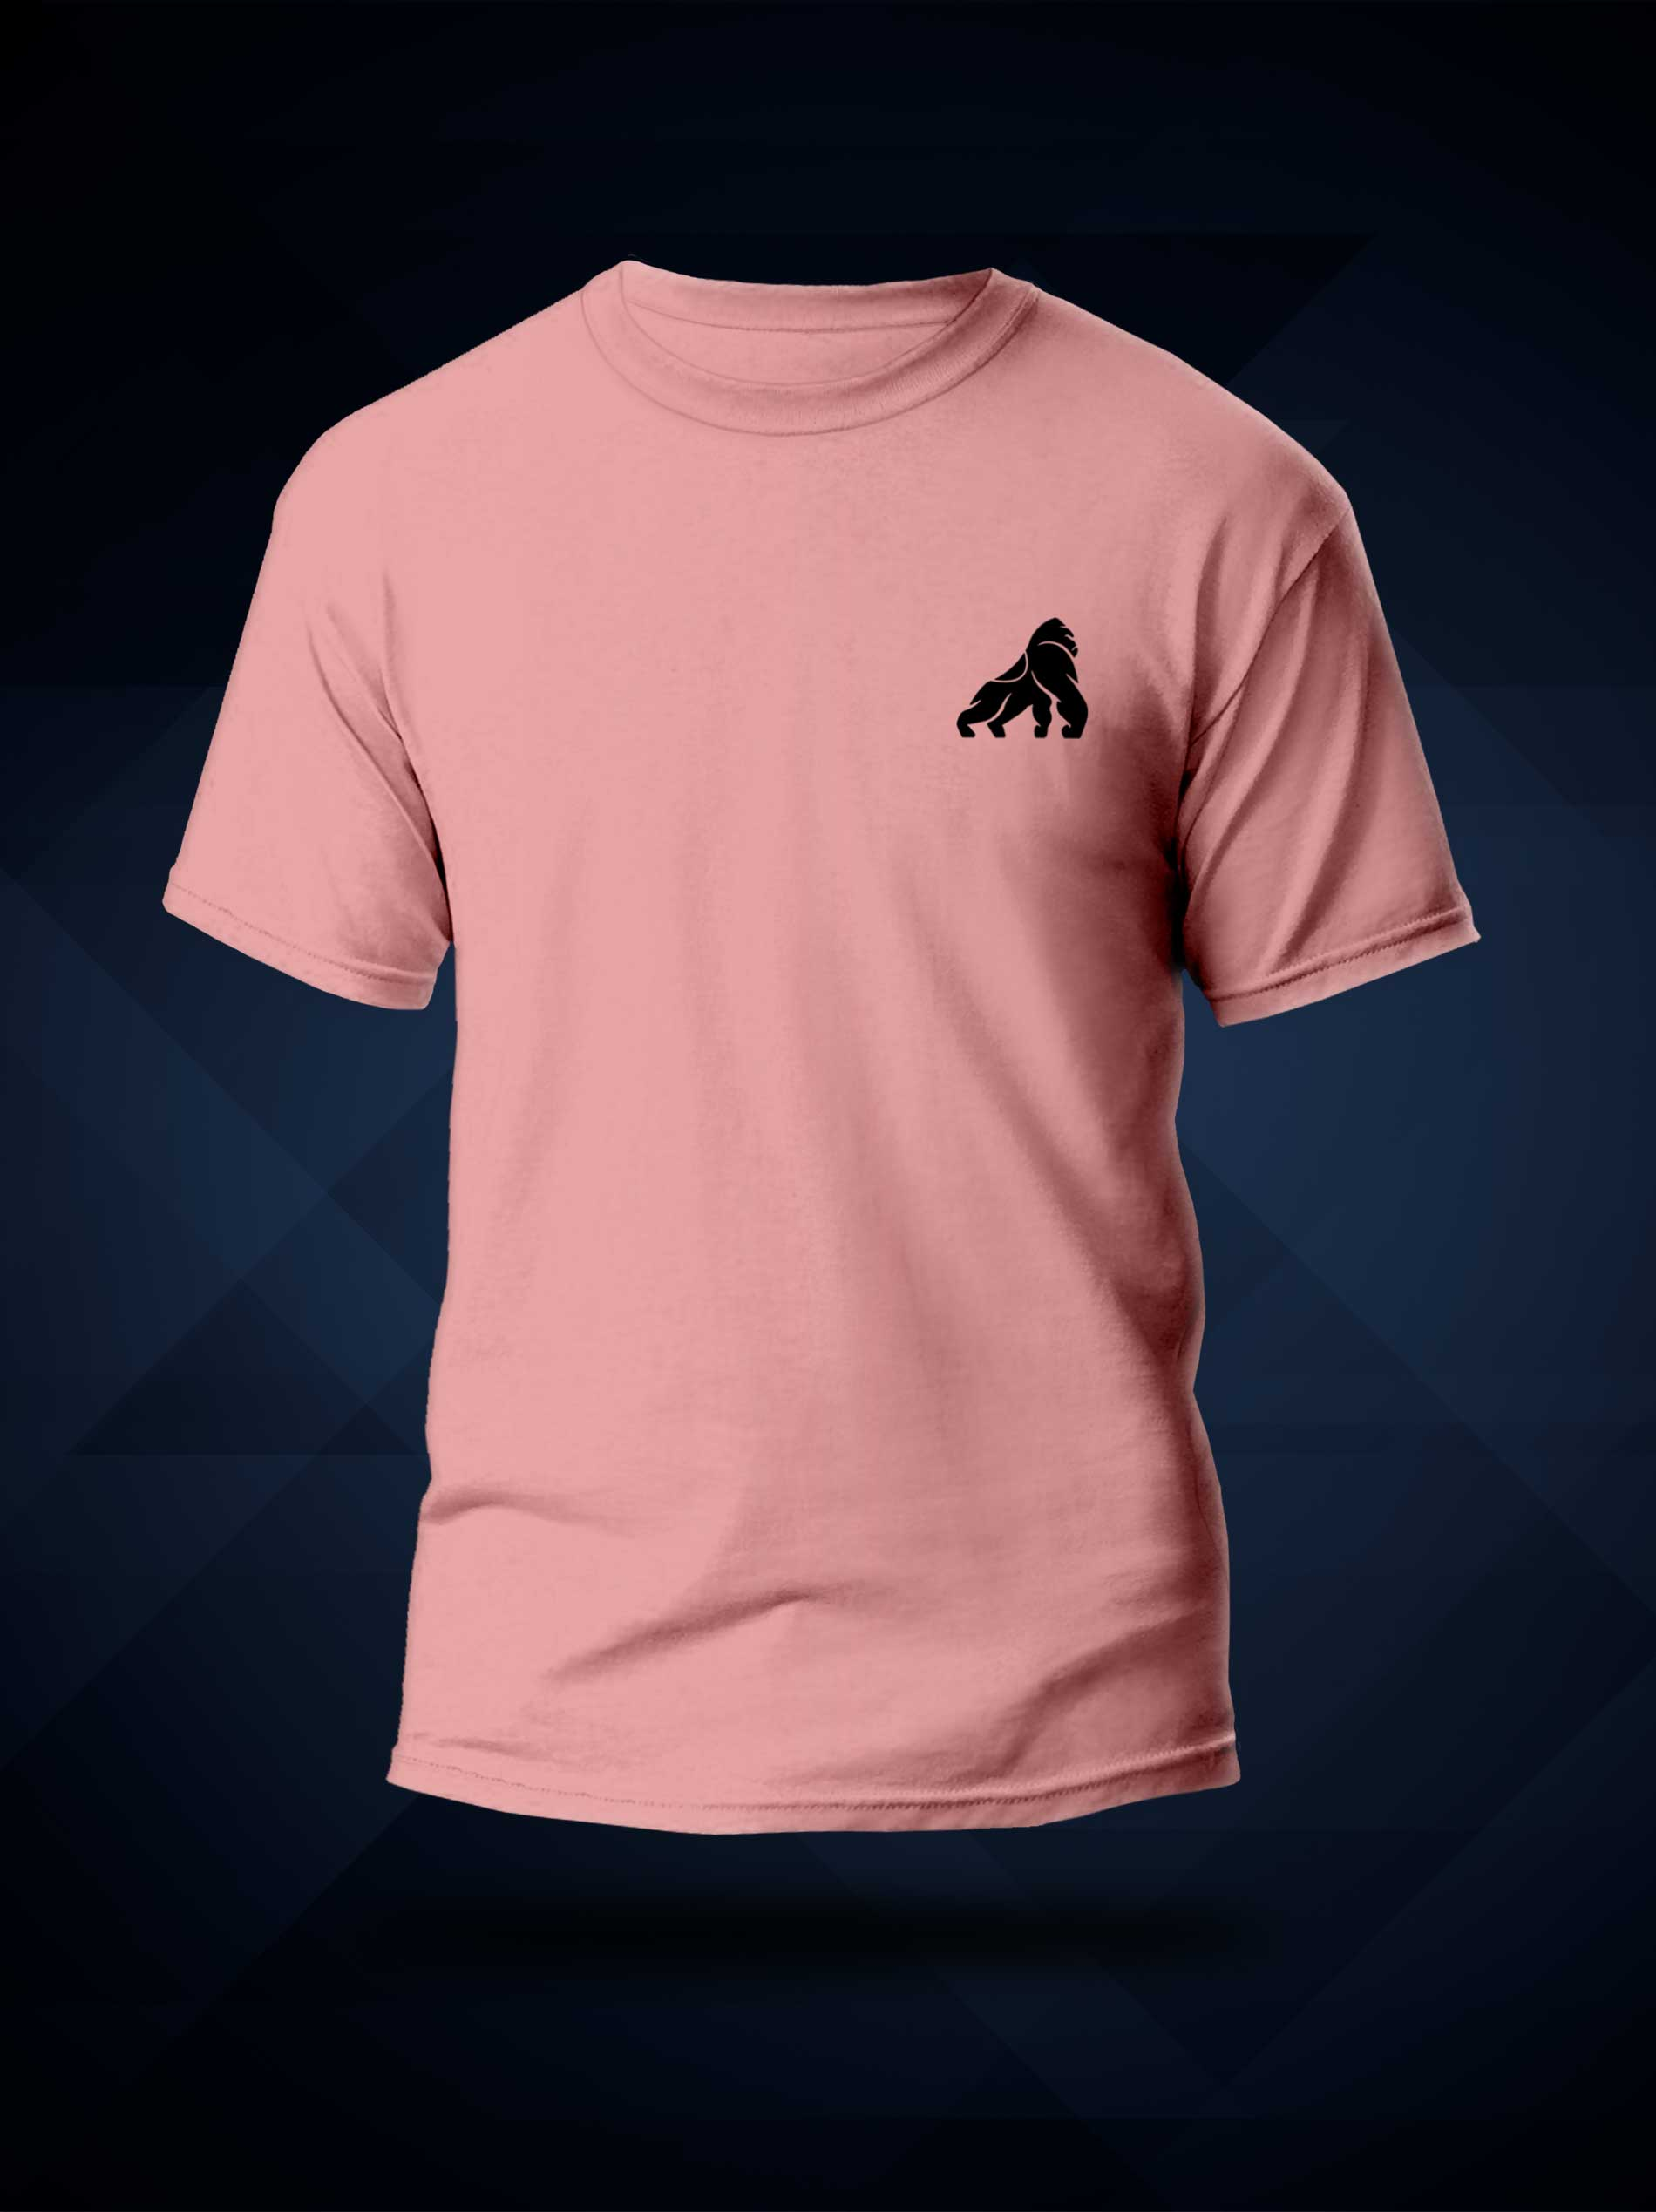 pink-tshirt-min